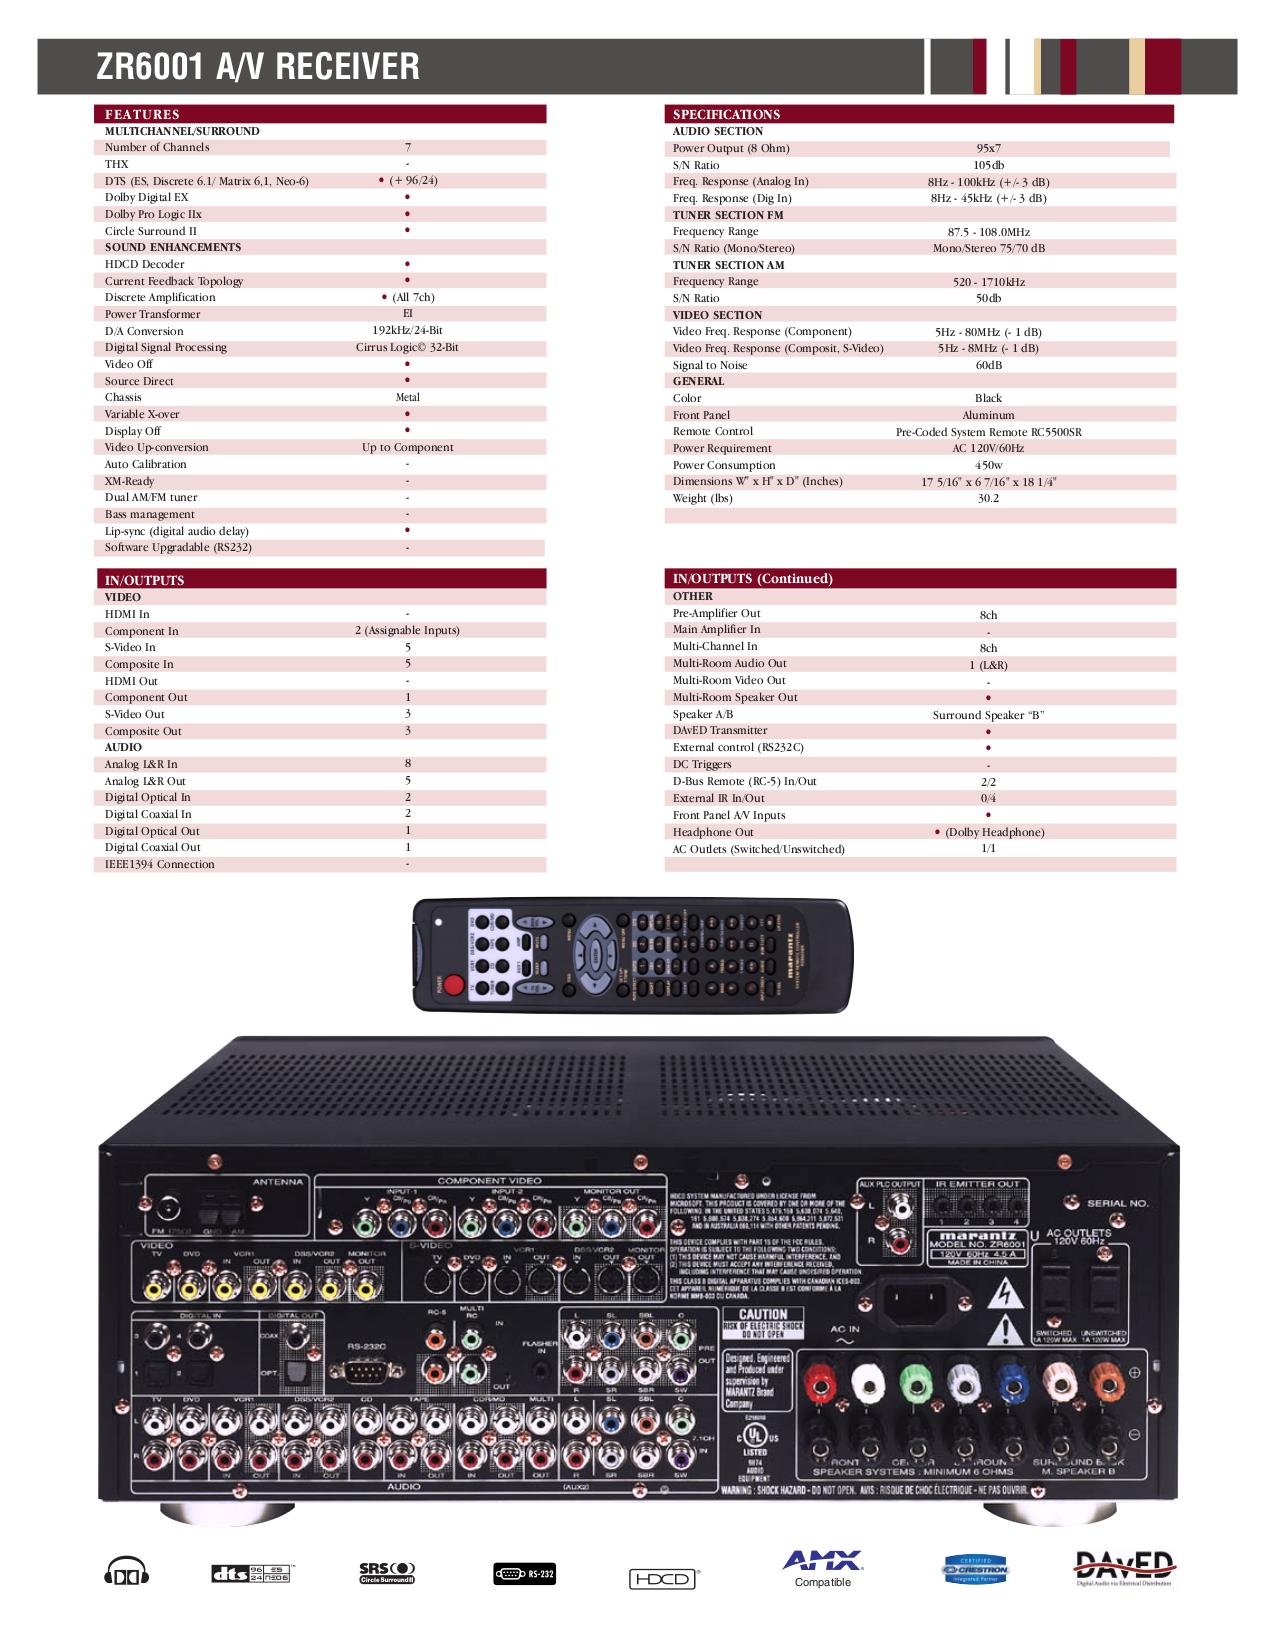 pdf manual for marantz receiver sr5600 rh umlib com marantz sr5600 service manual marantz sr5600 manuel français